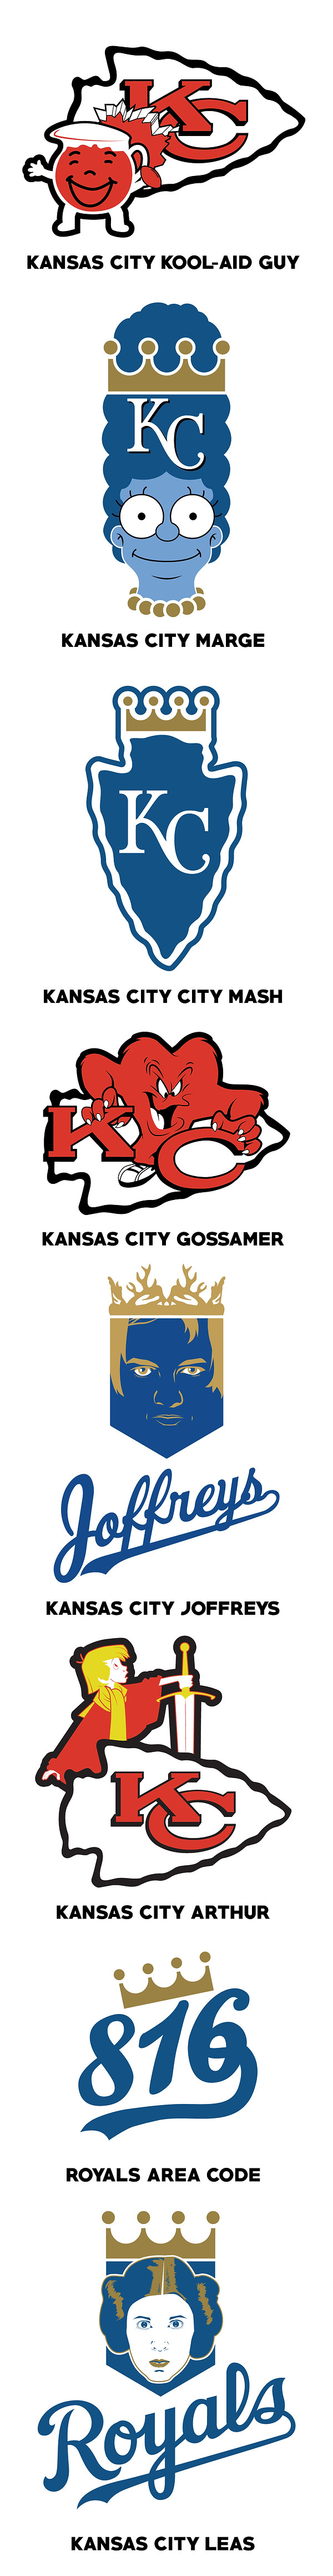 ALL_MASHUPS_Kansas-City.jpg